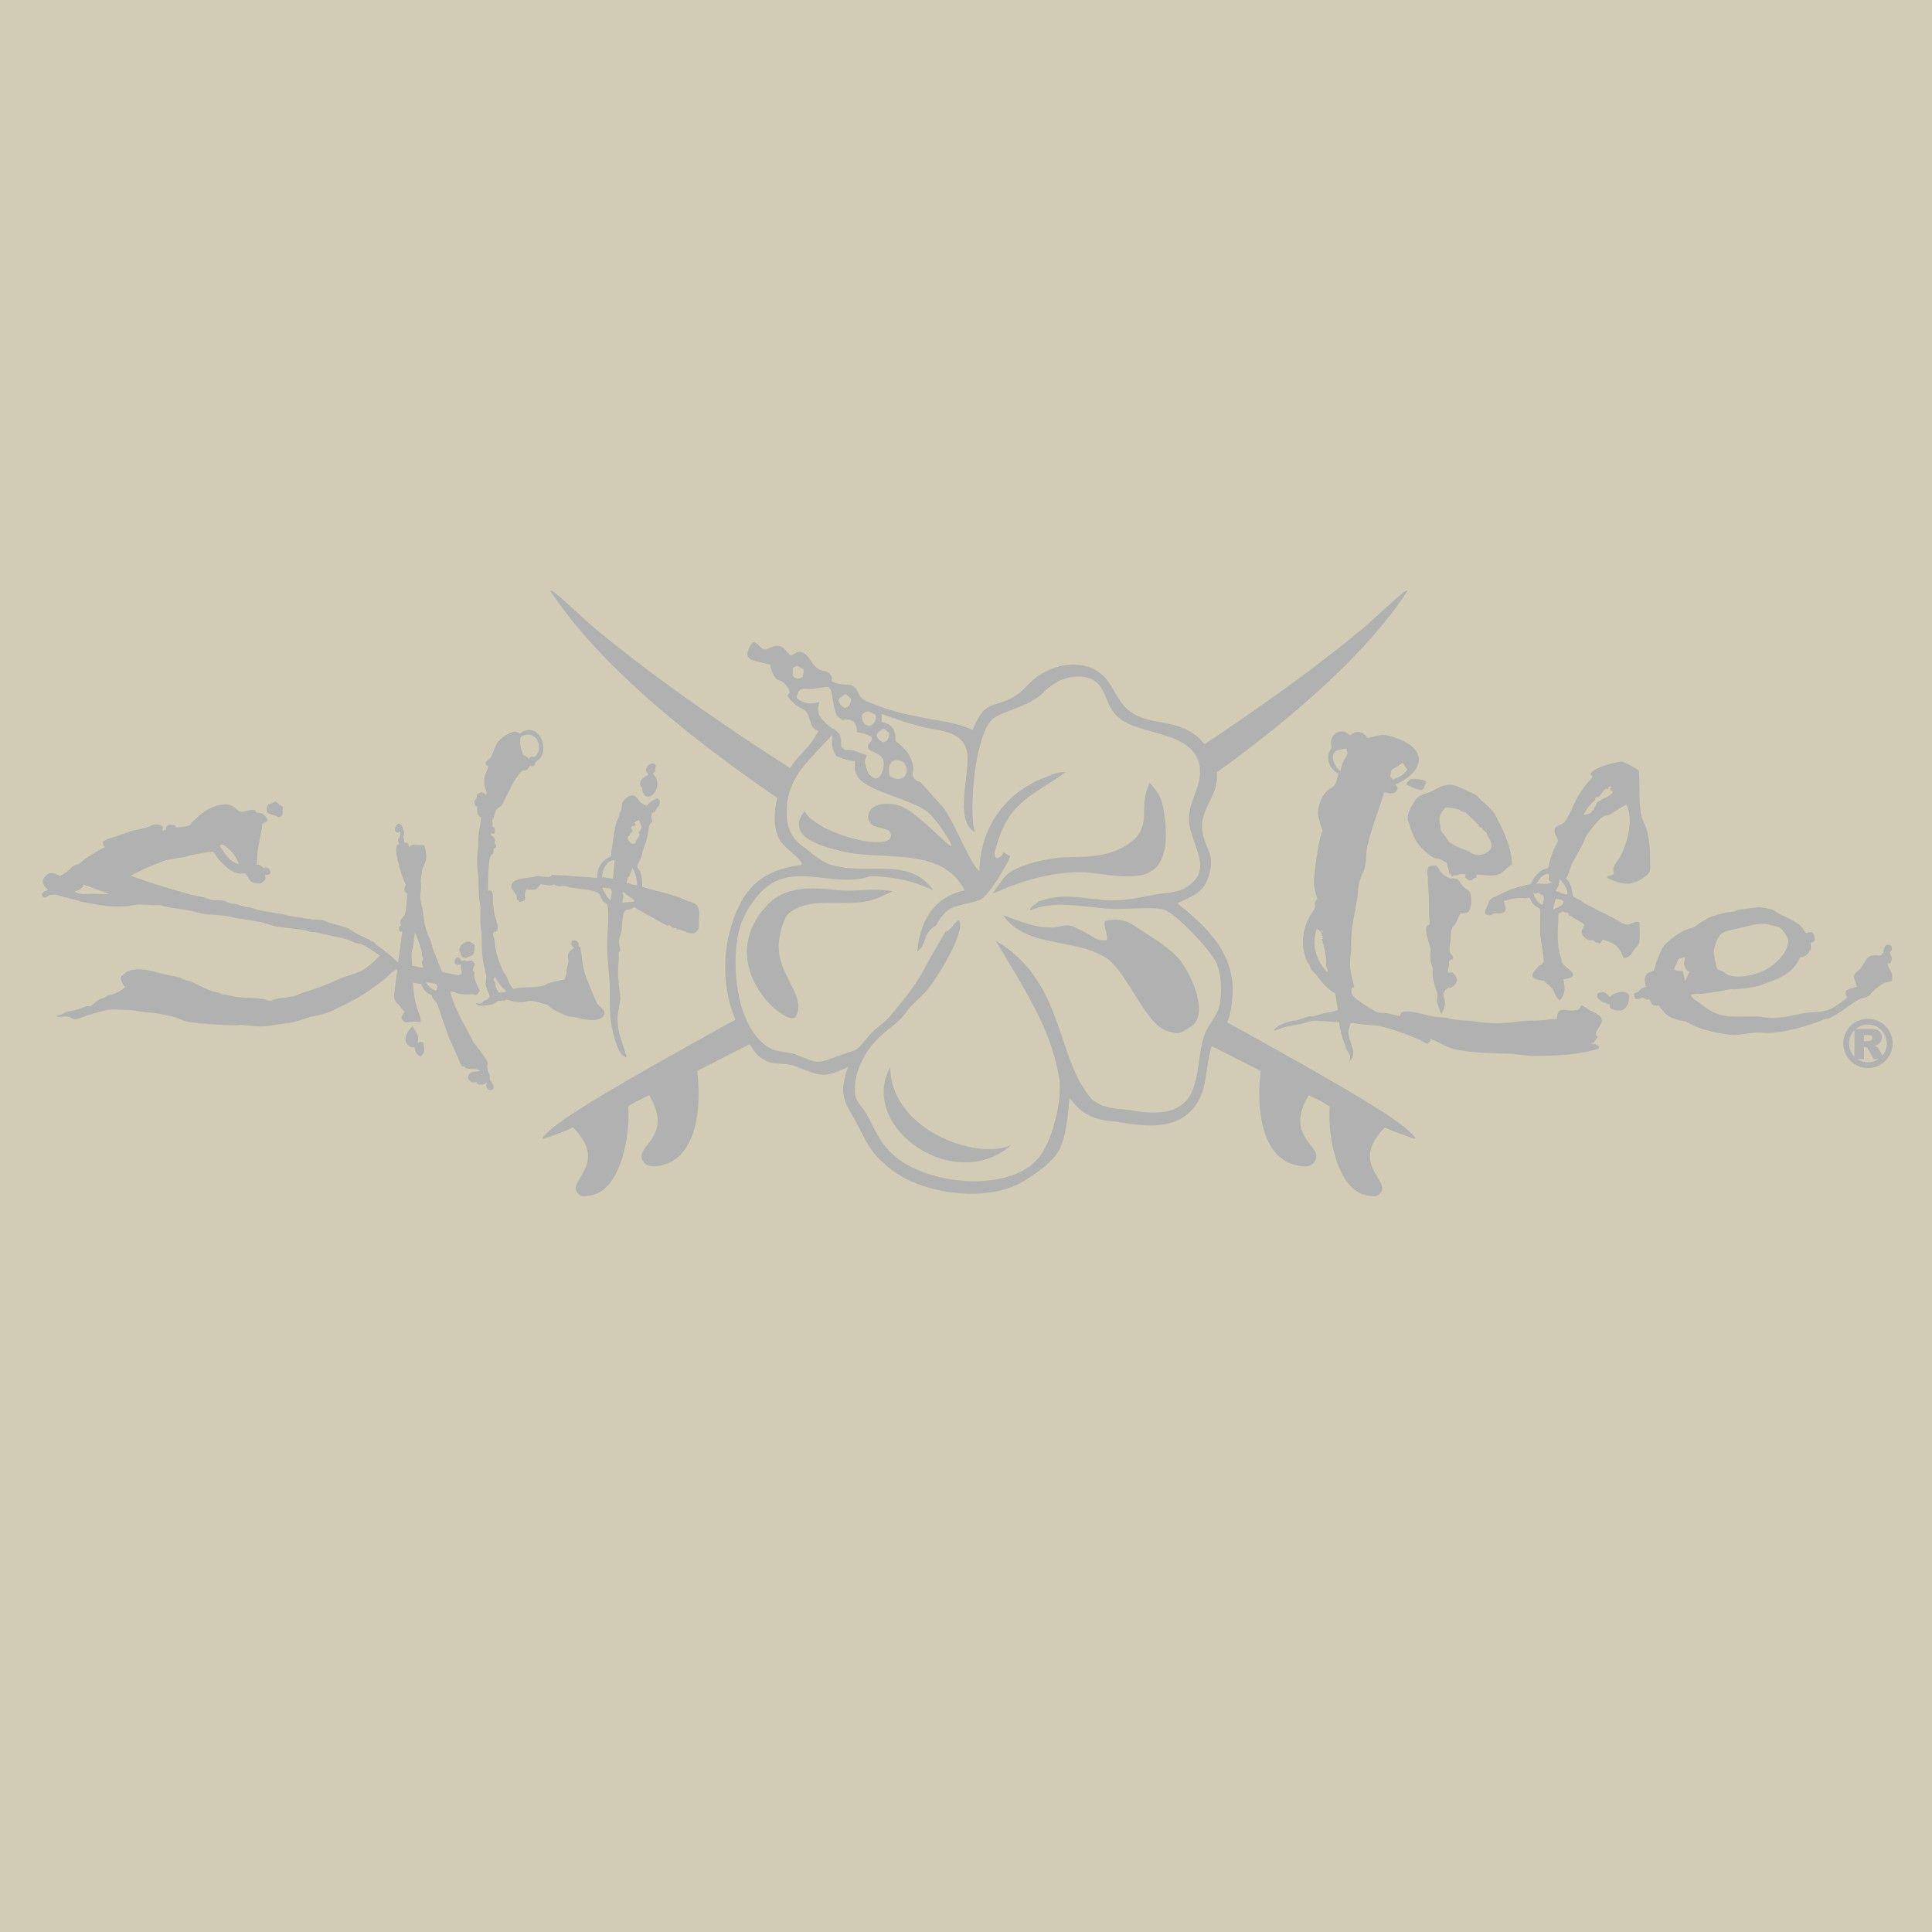 Salt Life Hibiscus And Boards Medium Decal Large Decal Salt Life Hibiscus [ 2500 x 2500 Pixel ]